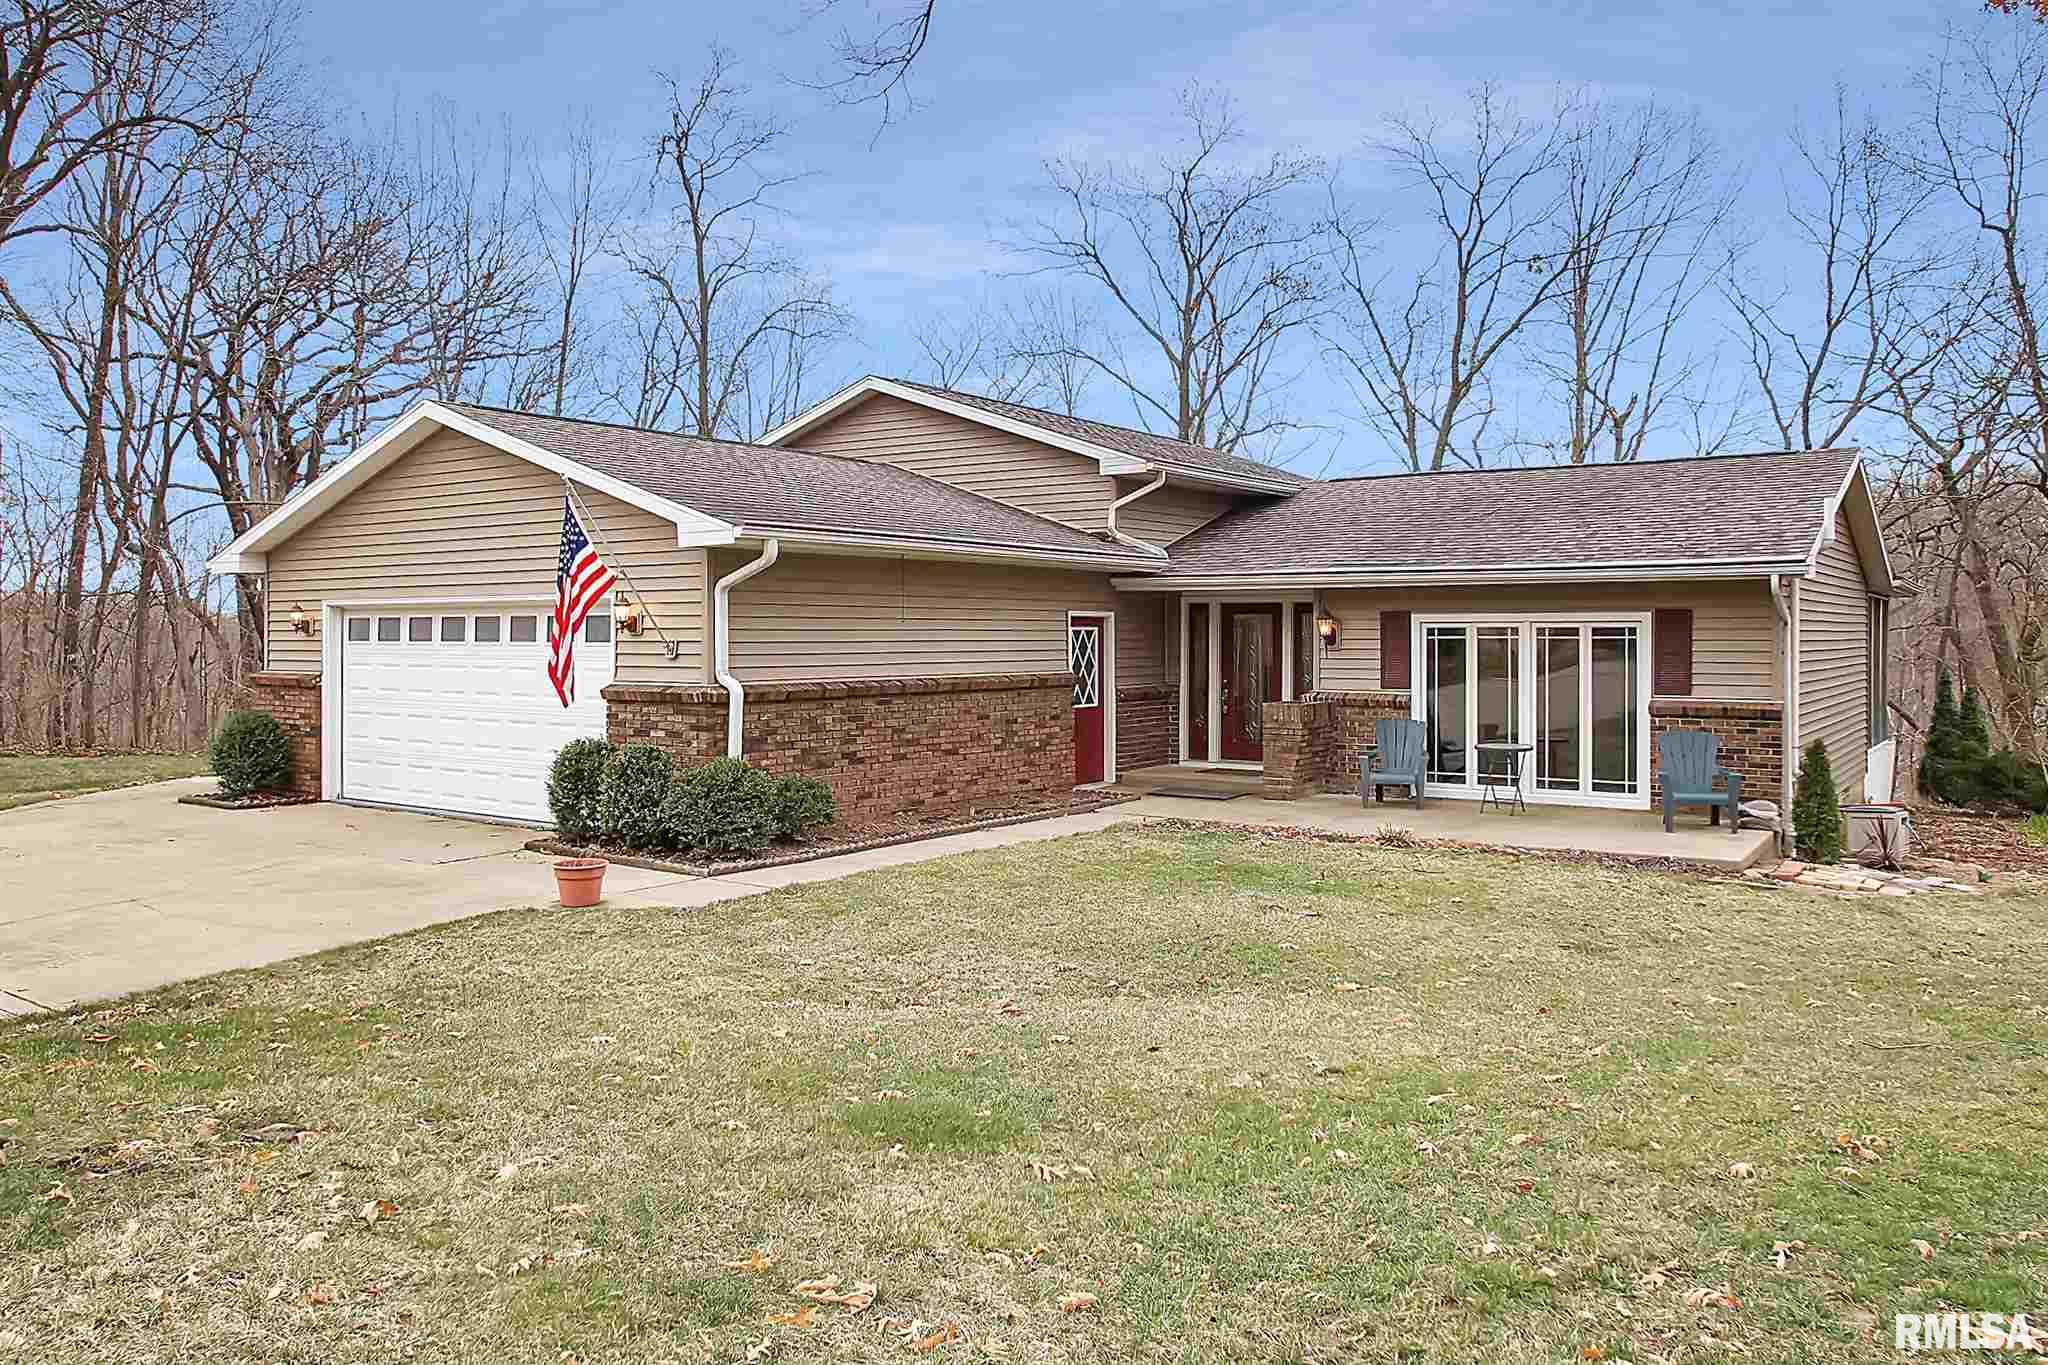 246 YUMA Property Photo - Hopewell, IL real estate listing